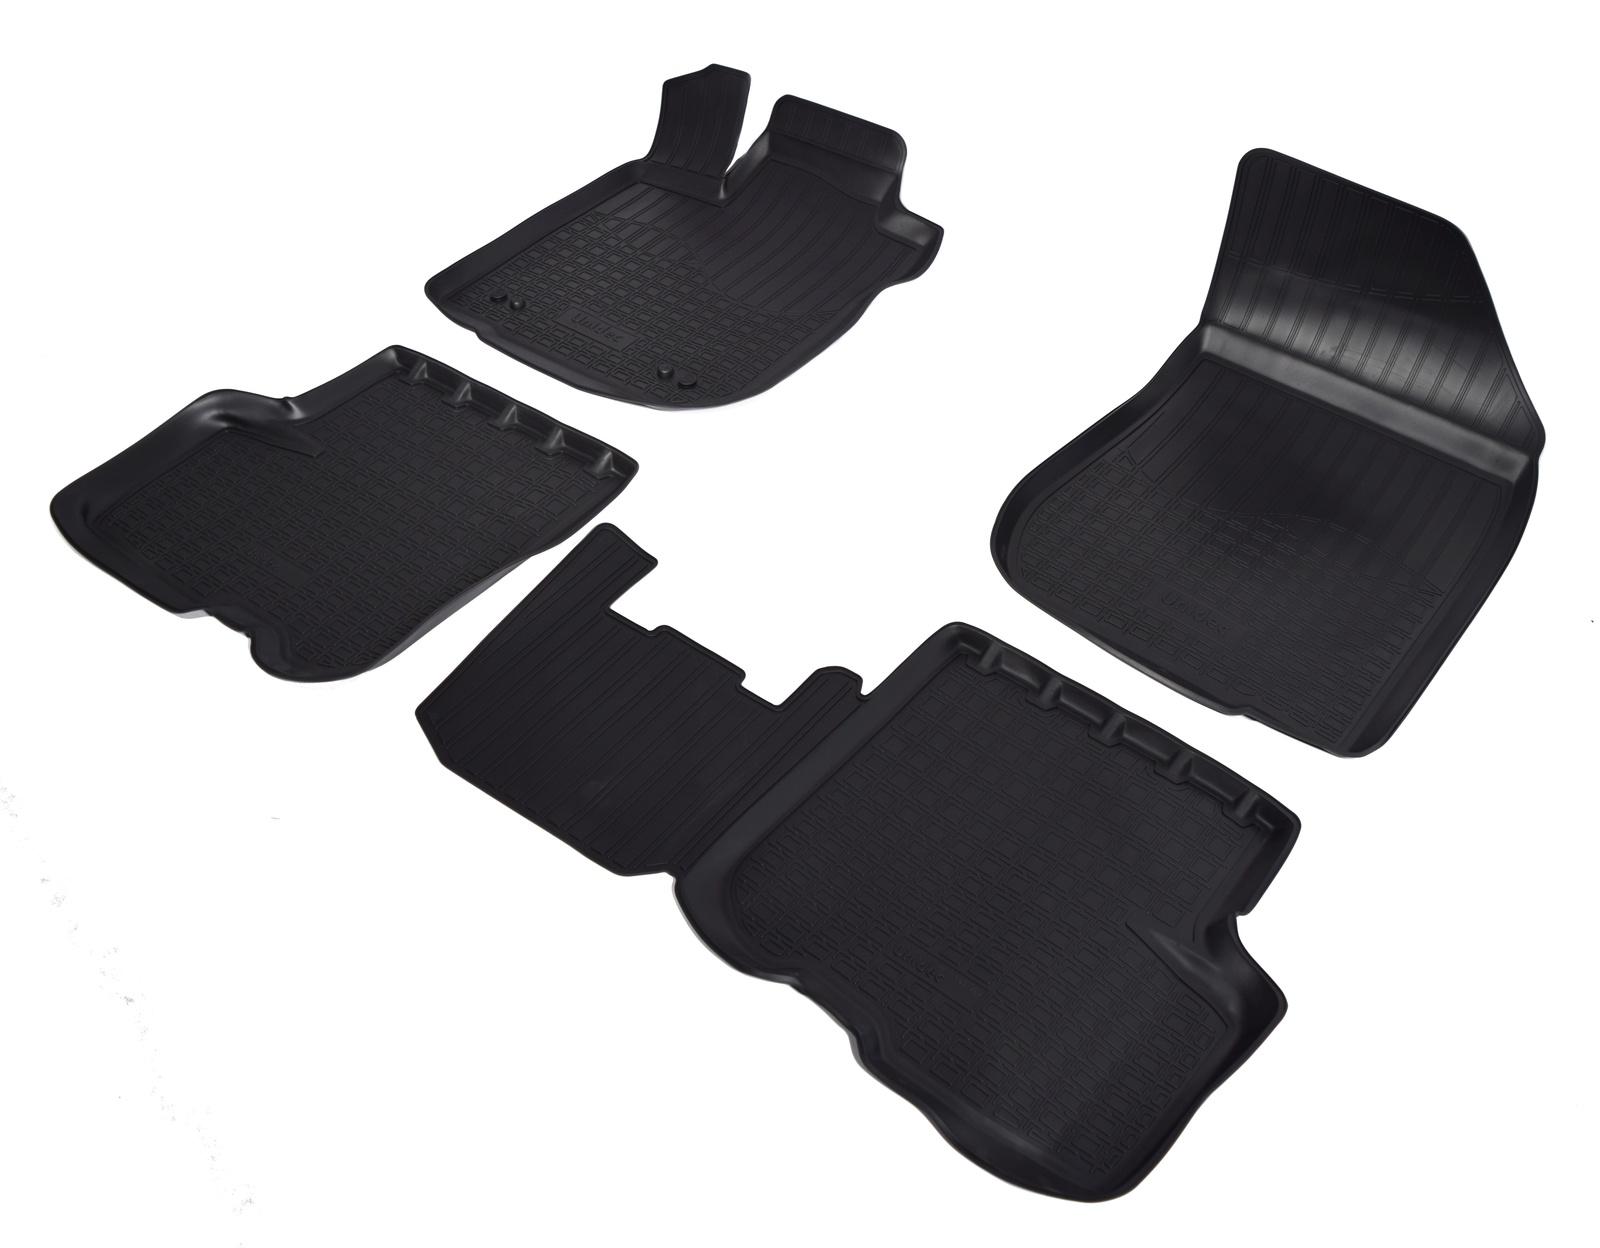 Коврики в салон автомобиля Norplast для Renault Logan L52 2014, NPA11-C69-350, черный сцепл в сб k7j logan renault 302055852r